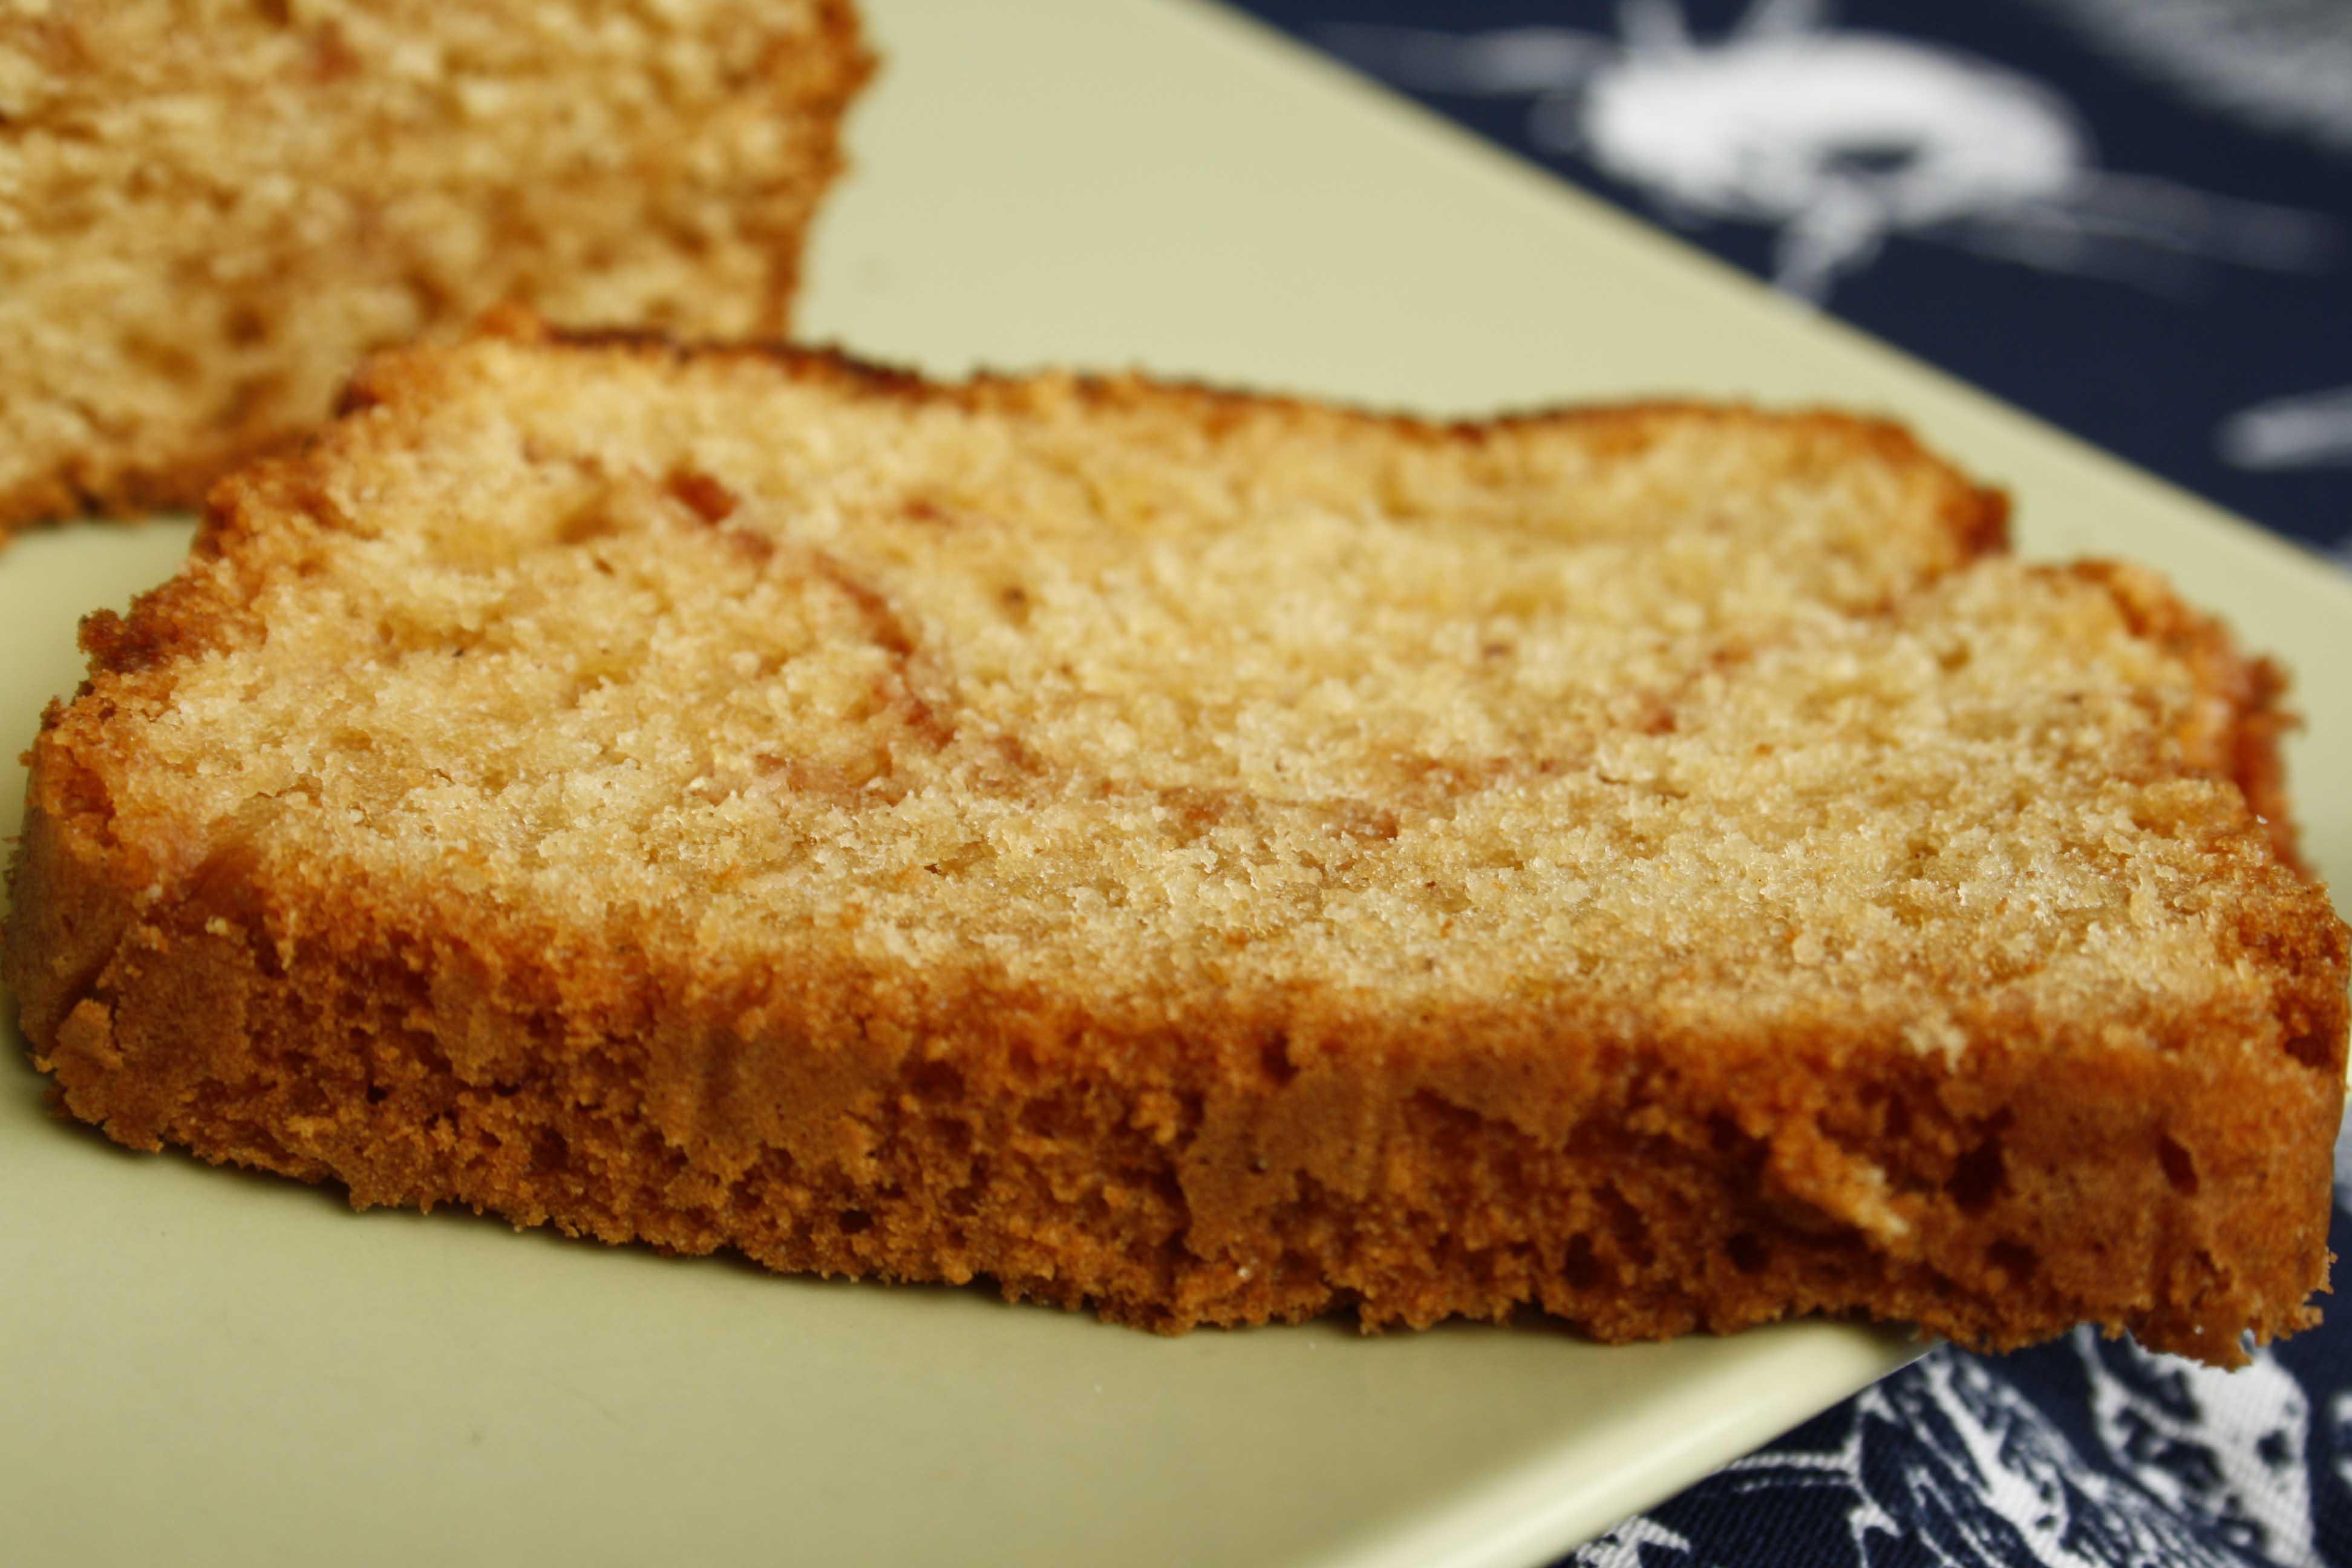 Zimt-Tee-Brot // Cinnamon-Sugar-Crust Cinnamon-Ribbon-Bread by http://babyrockmyday.com/zimt-tee-brot/